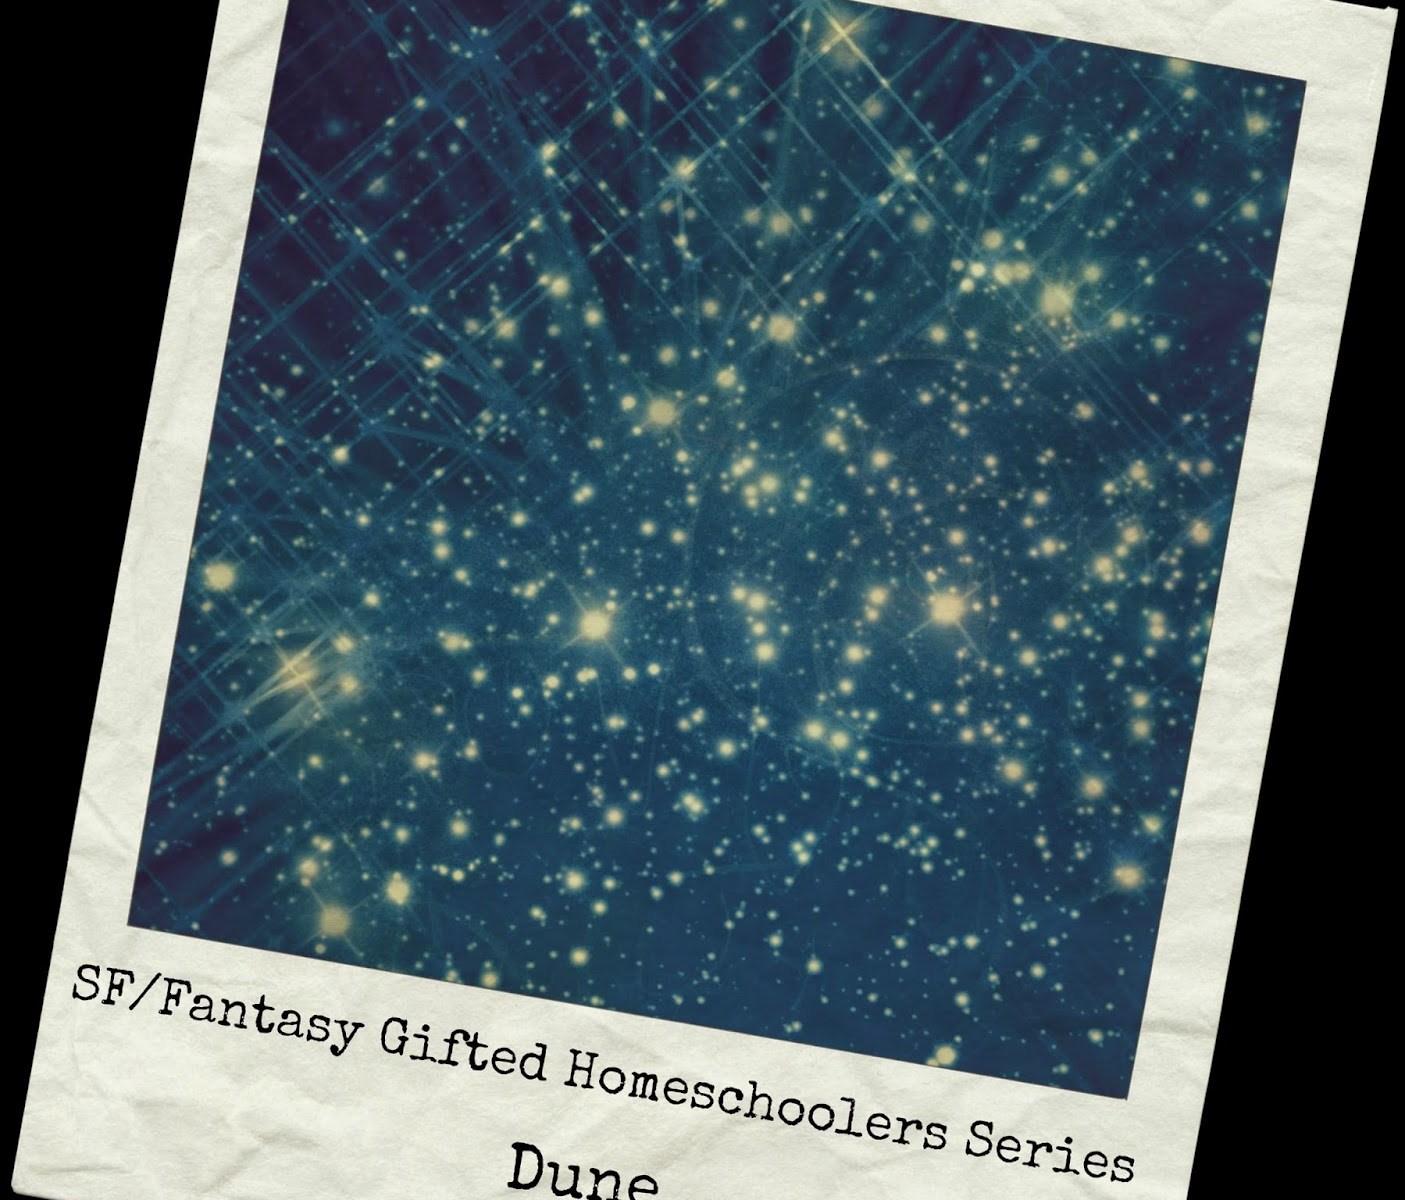 SF/Fantasy Gifted Homeschoolers Series, Dune, yellowreadis.com Image: Old photo of stars